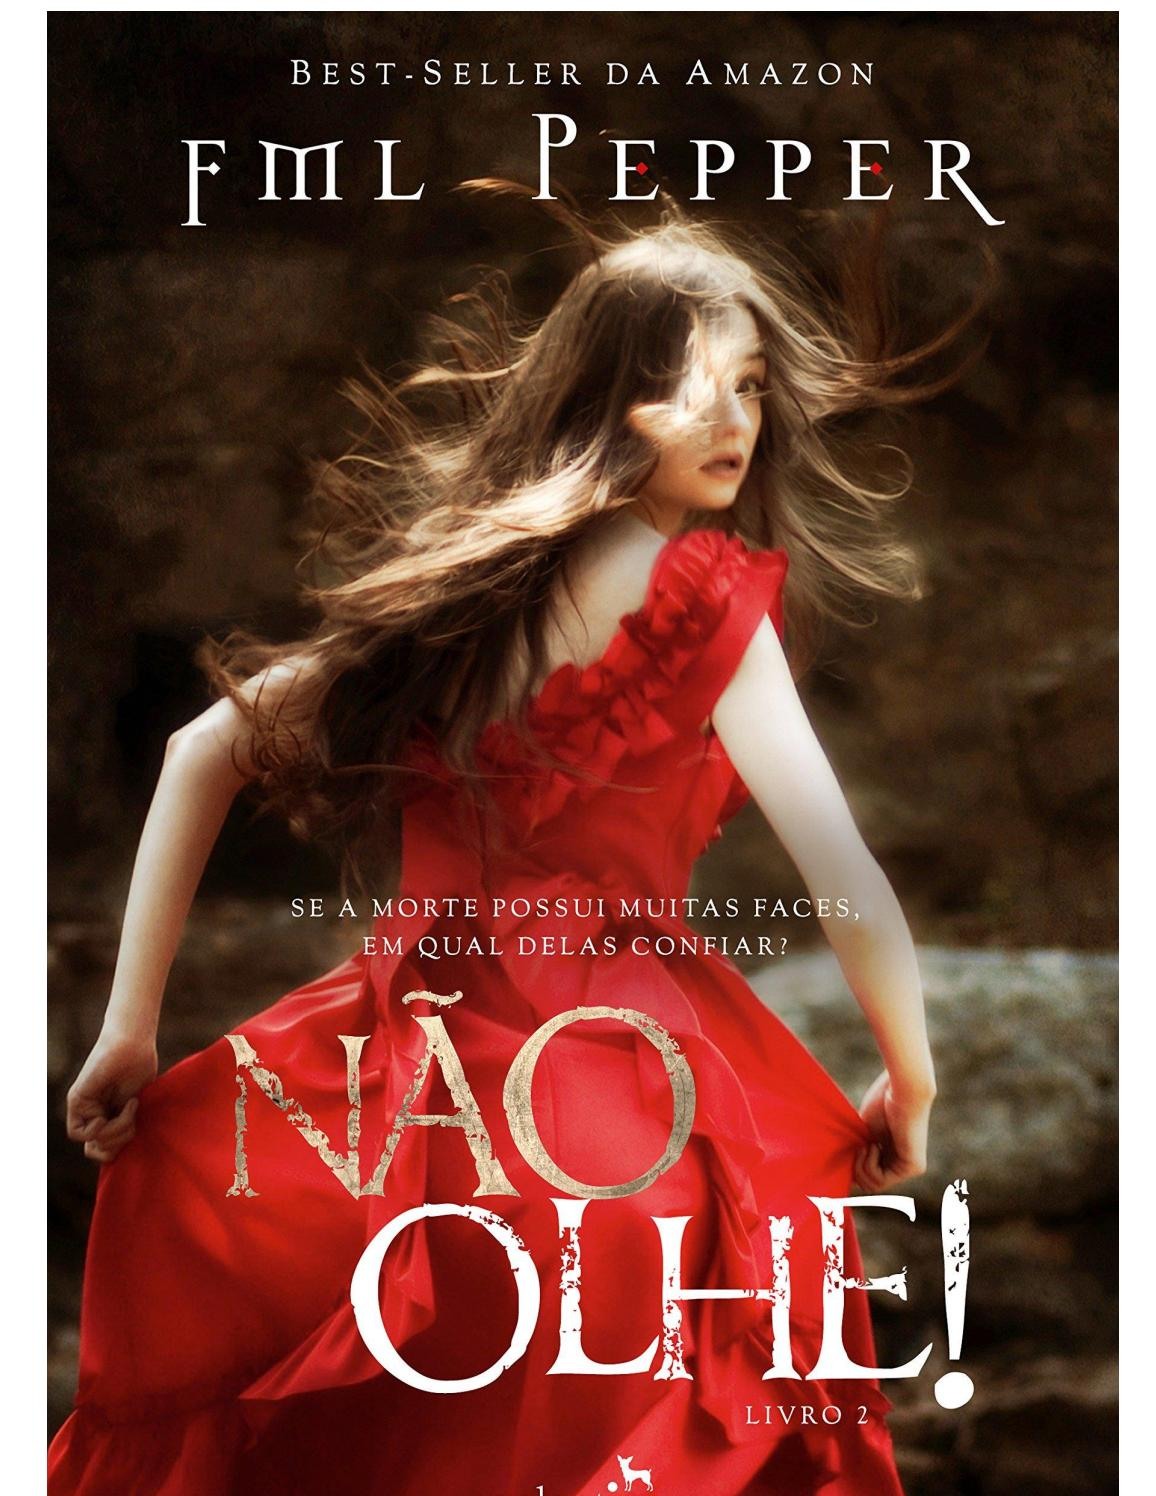 ff481b9376 Não Olhe! - Livro 2 by rayane kelly - issuu